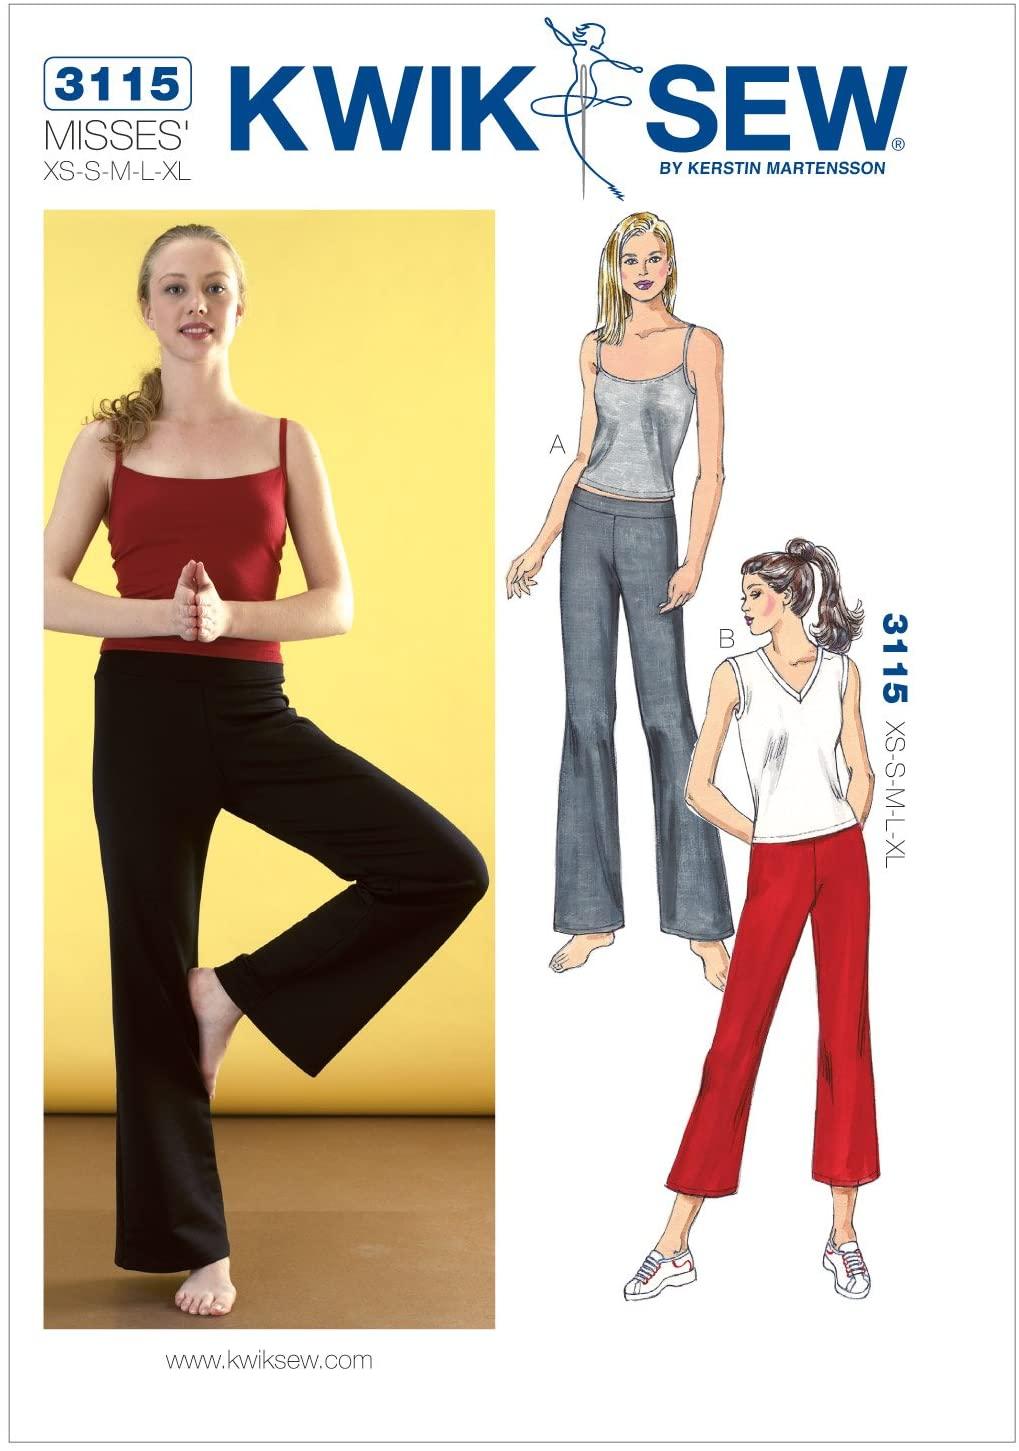 Kwik Sew K3115 Pants and Tops Sewing Pattern, Size XS-S-M-L-XL